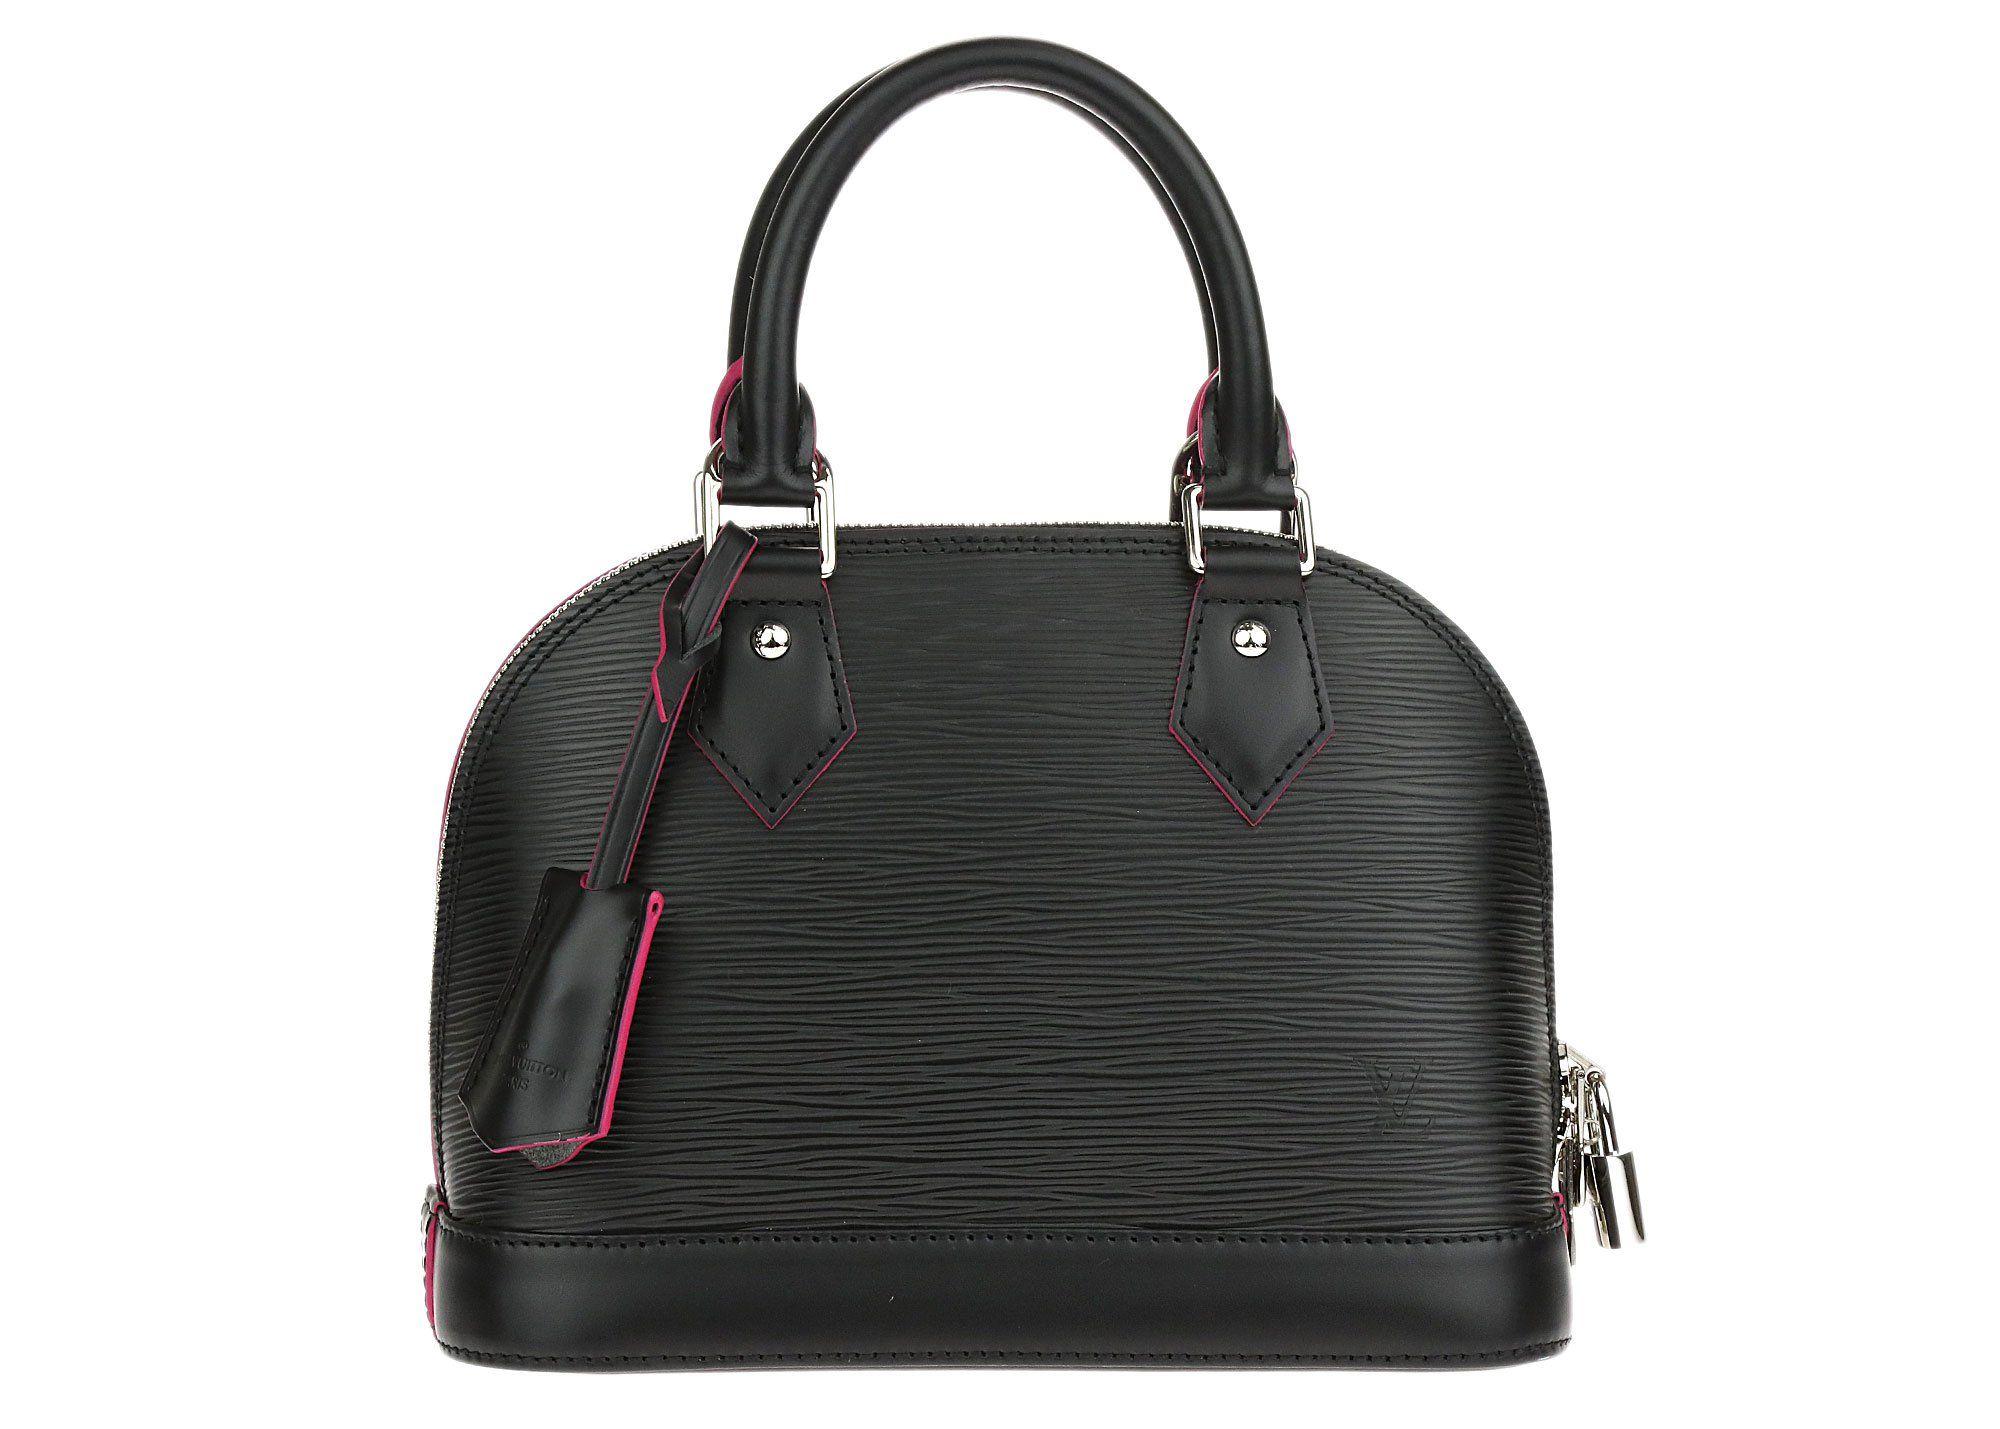 Louis vuitton black alma bb epi louis vuitton handbags